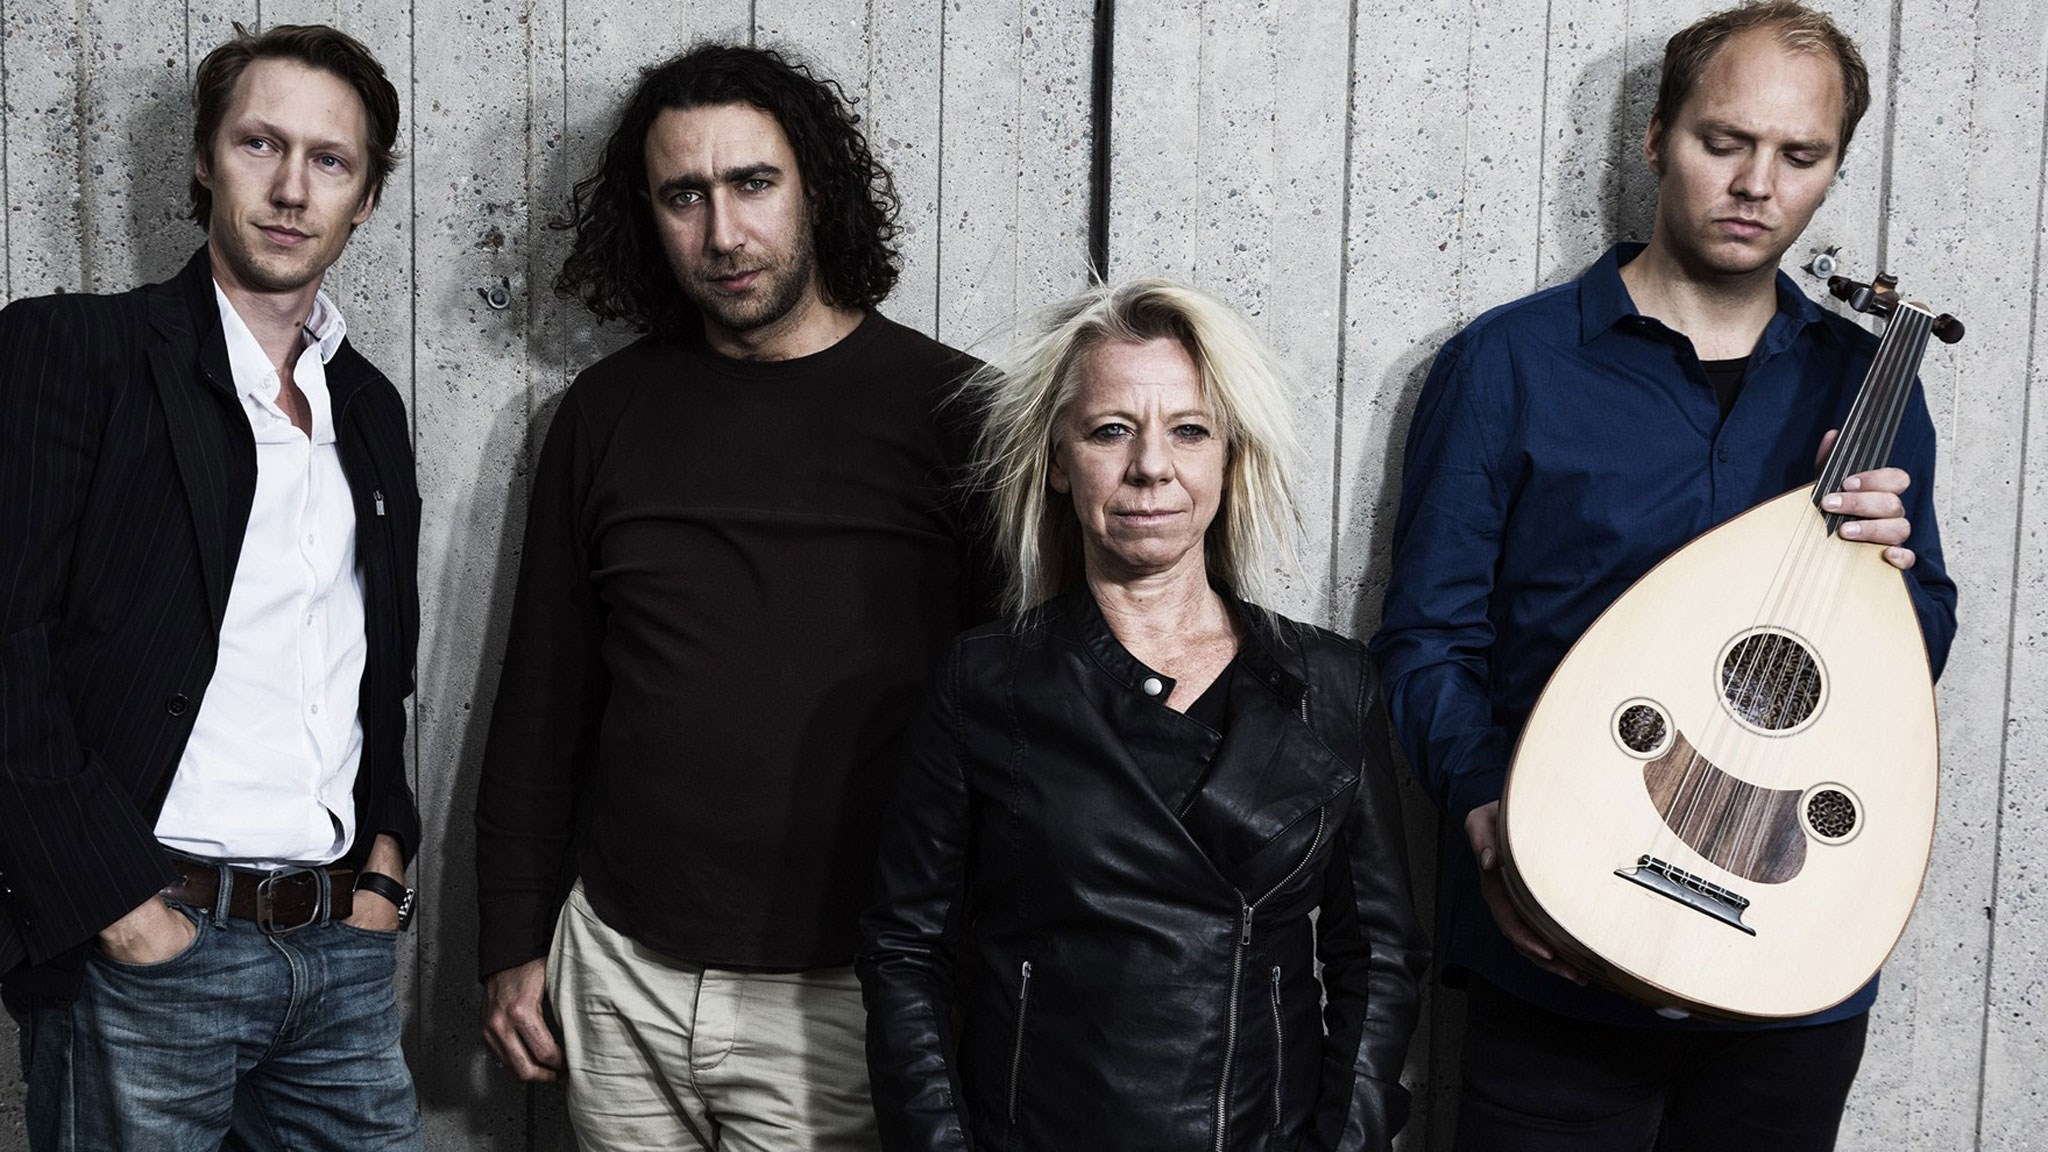 Till Damaskus: Simon J Berger, Ghayath Almadhoun, Marie Silkeberg och Fredrik Schützler. ©Mattias Ahlm/Sveriges Radio